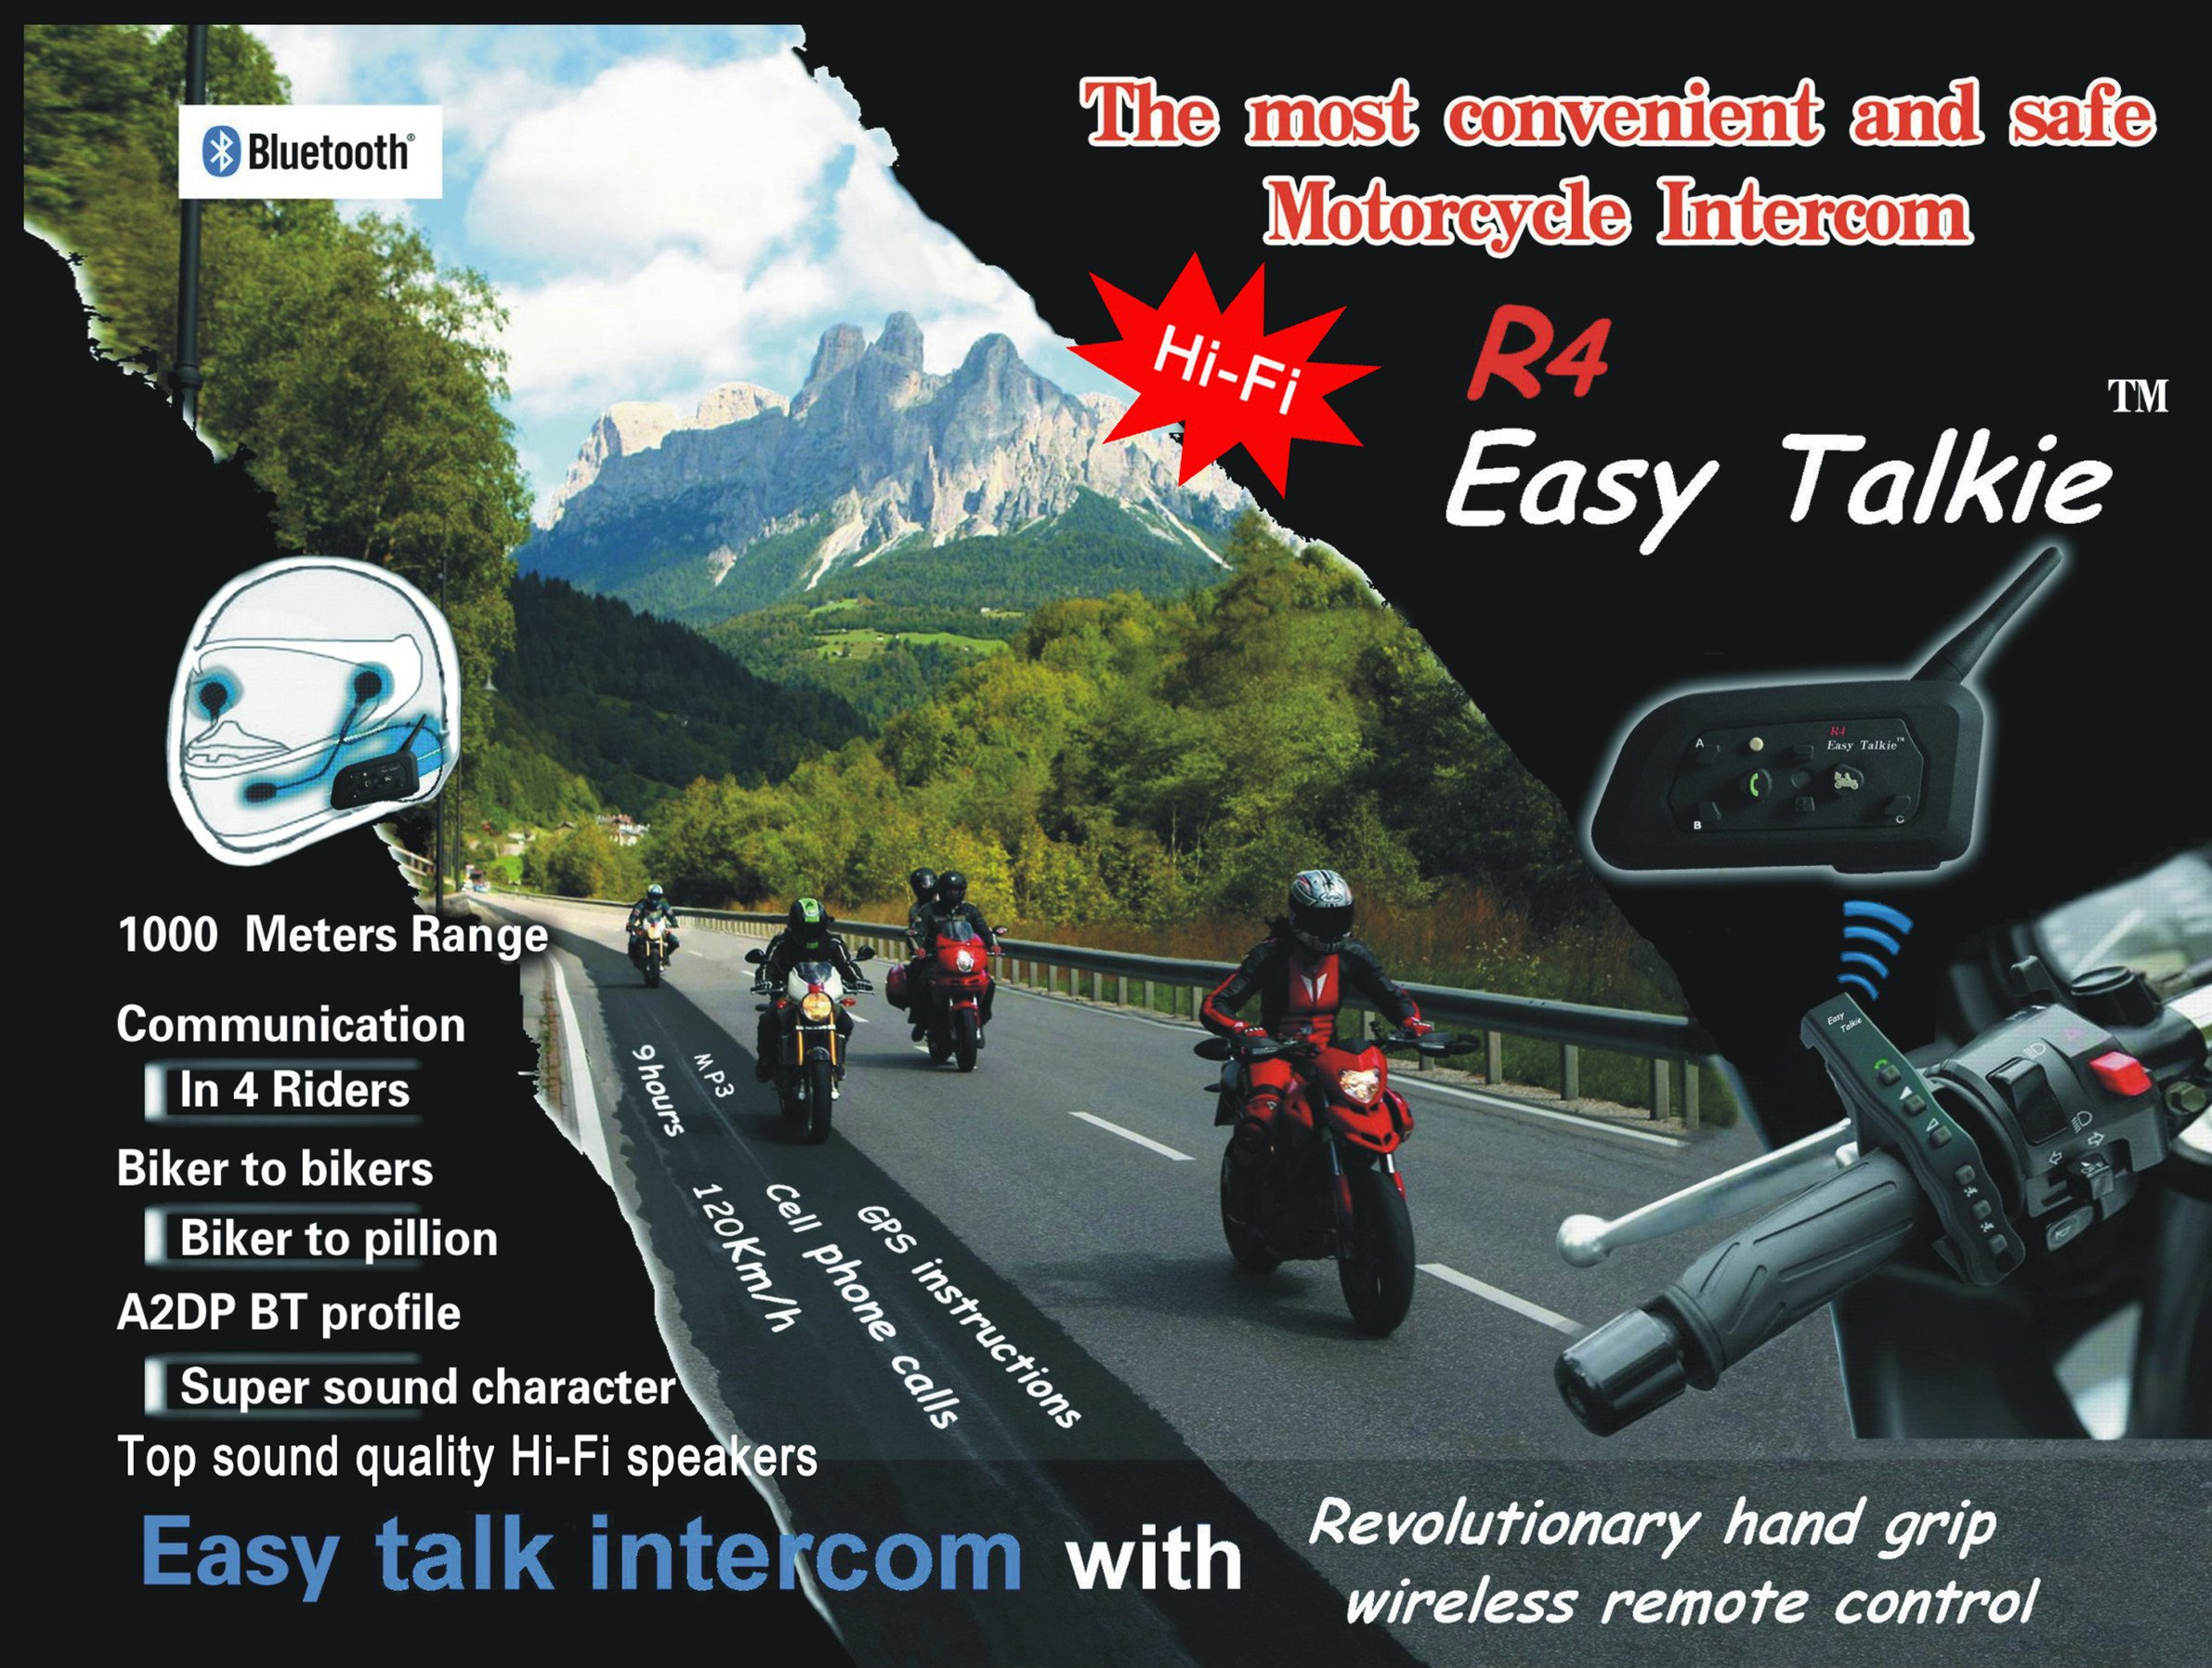 YUENY MOTO R4 Easy Talkie BT Interphone Bluetooth Intercom Bluetooth Motorbike Motorcycle Helmet Communication Intercom Headset System with Remote Control